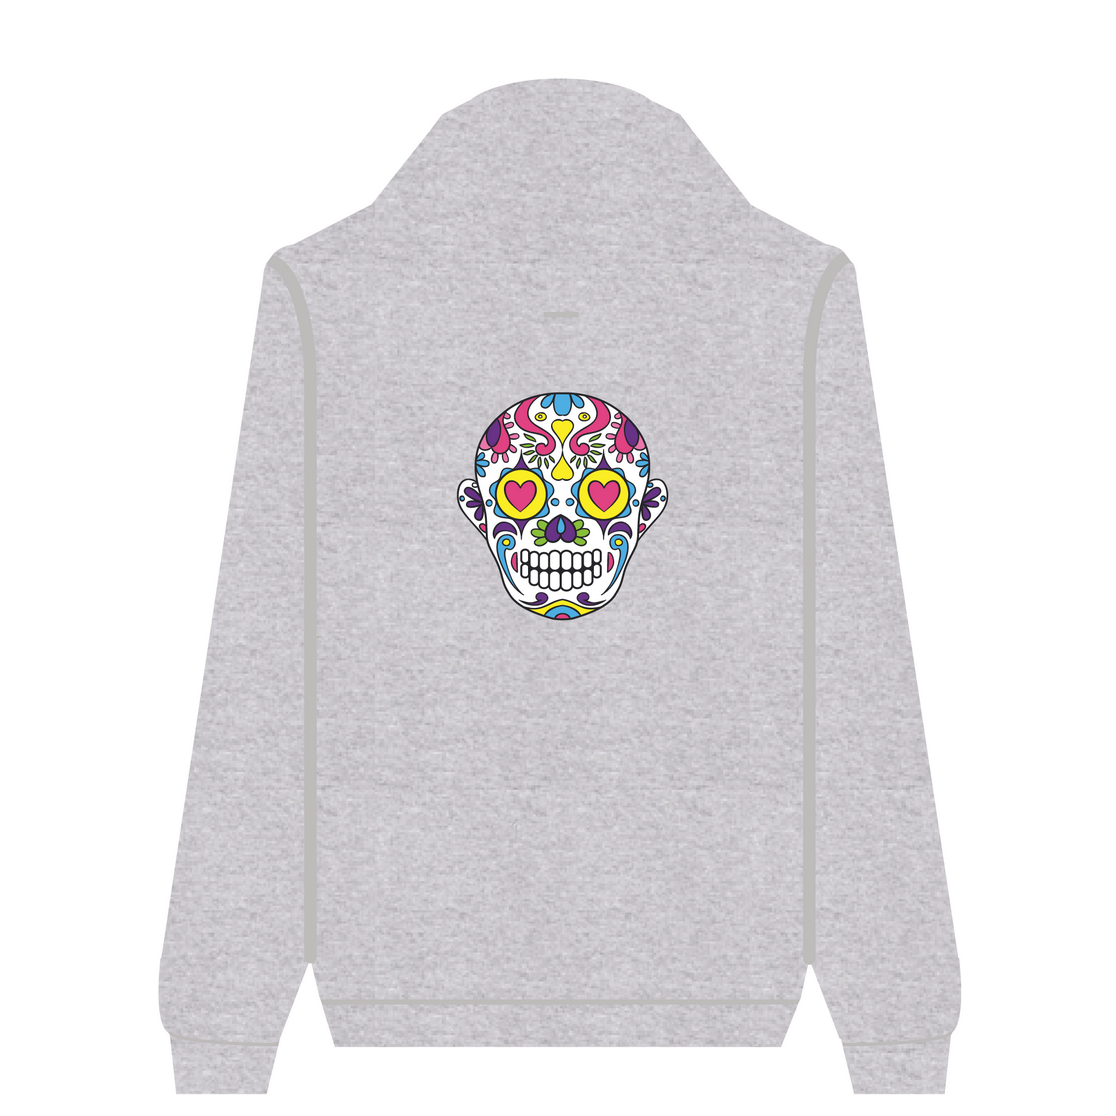 Full Zip Hoodie Love Skull | Wuzzee